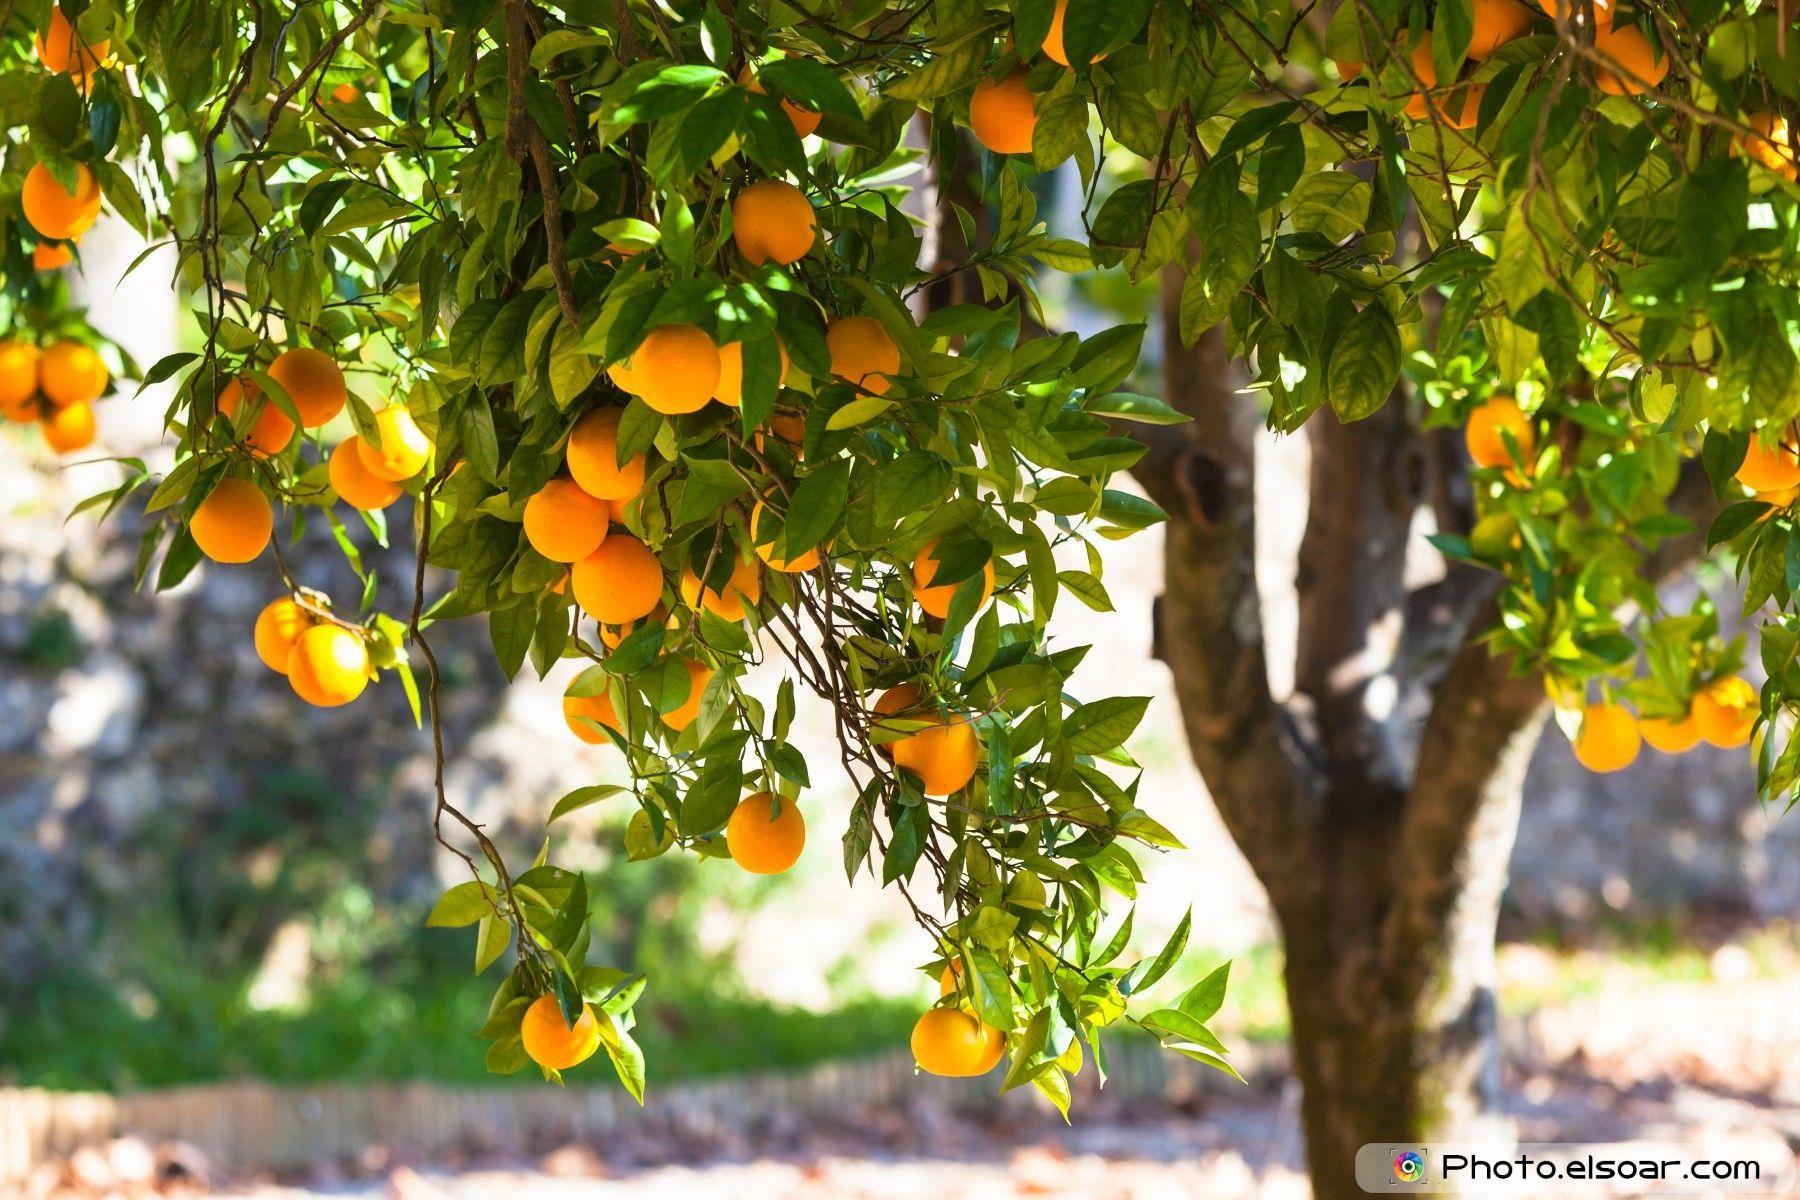 Orange-tree-with-ripe-fruits-in-sunlight.jpg (1800×1200)